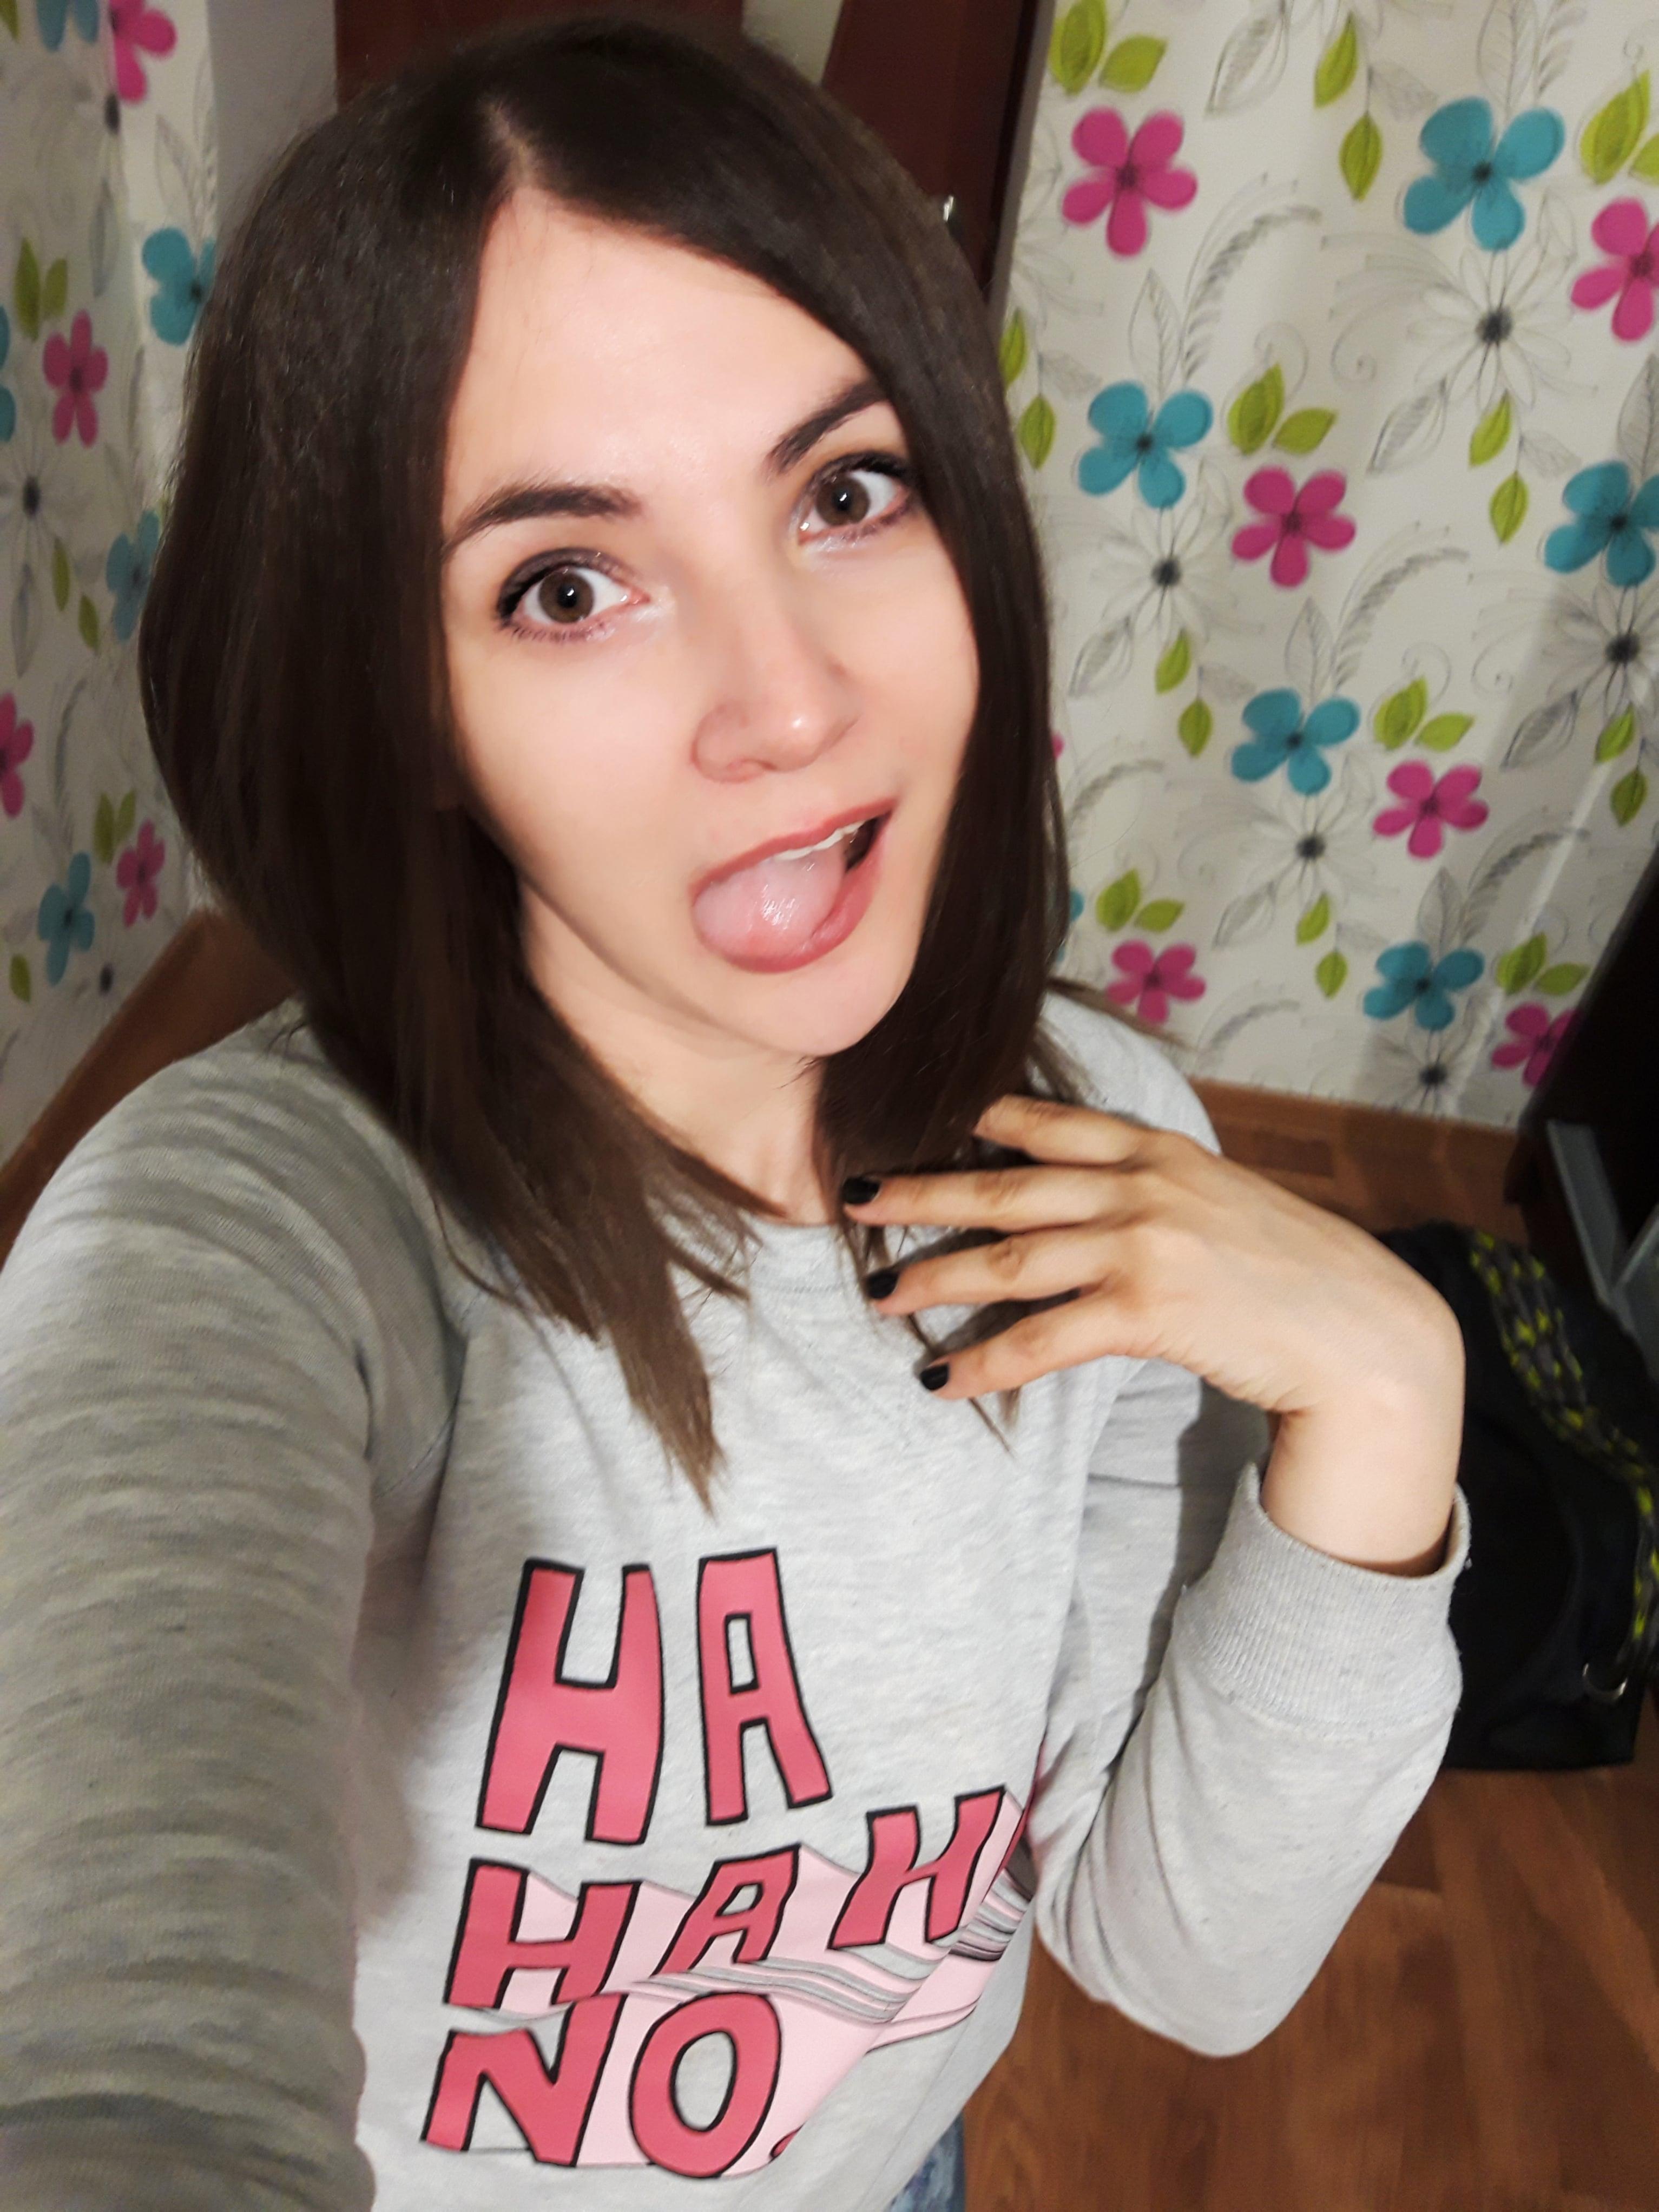 GoddessLesley Selfie